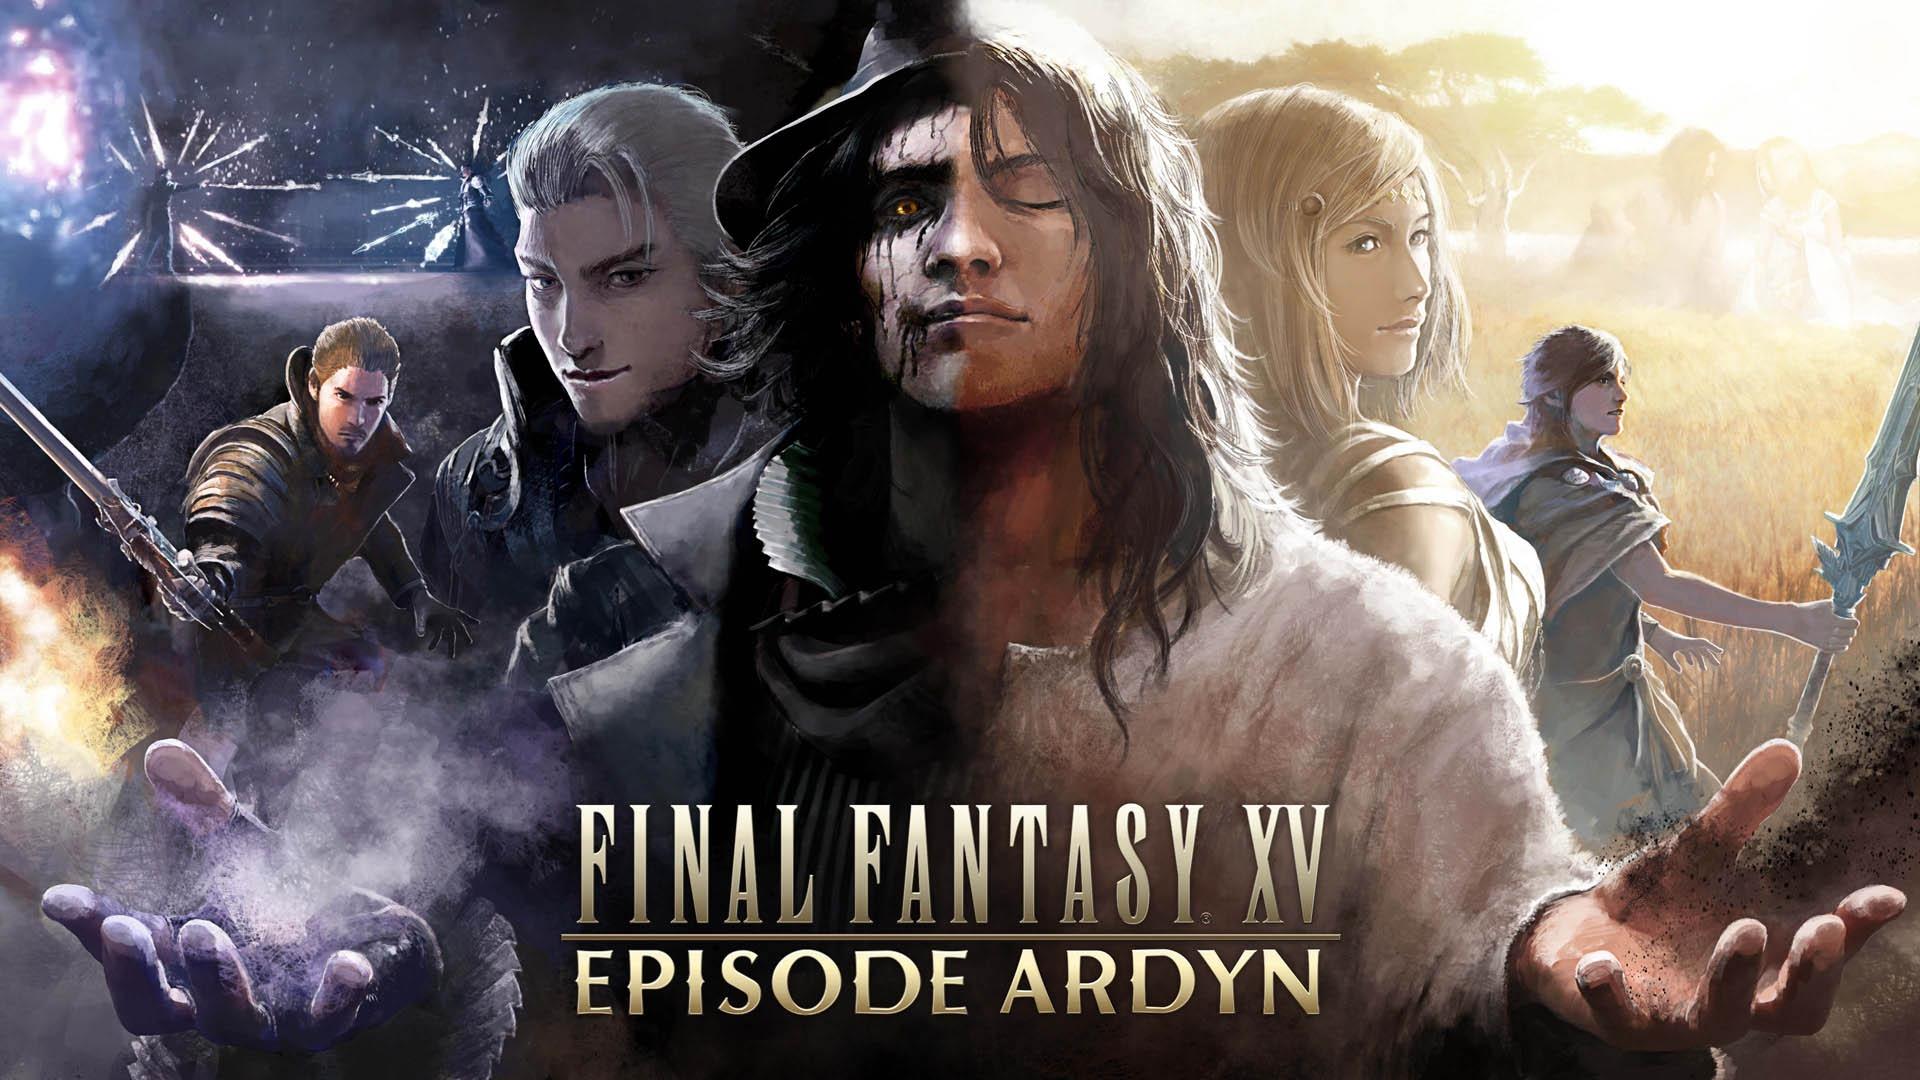 Новости по тегу final fantasy xv, страница 1 из 13